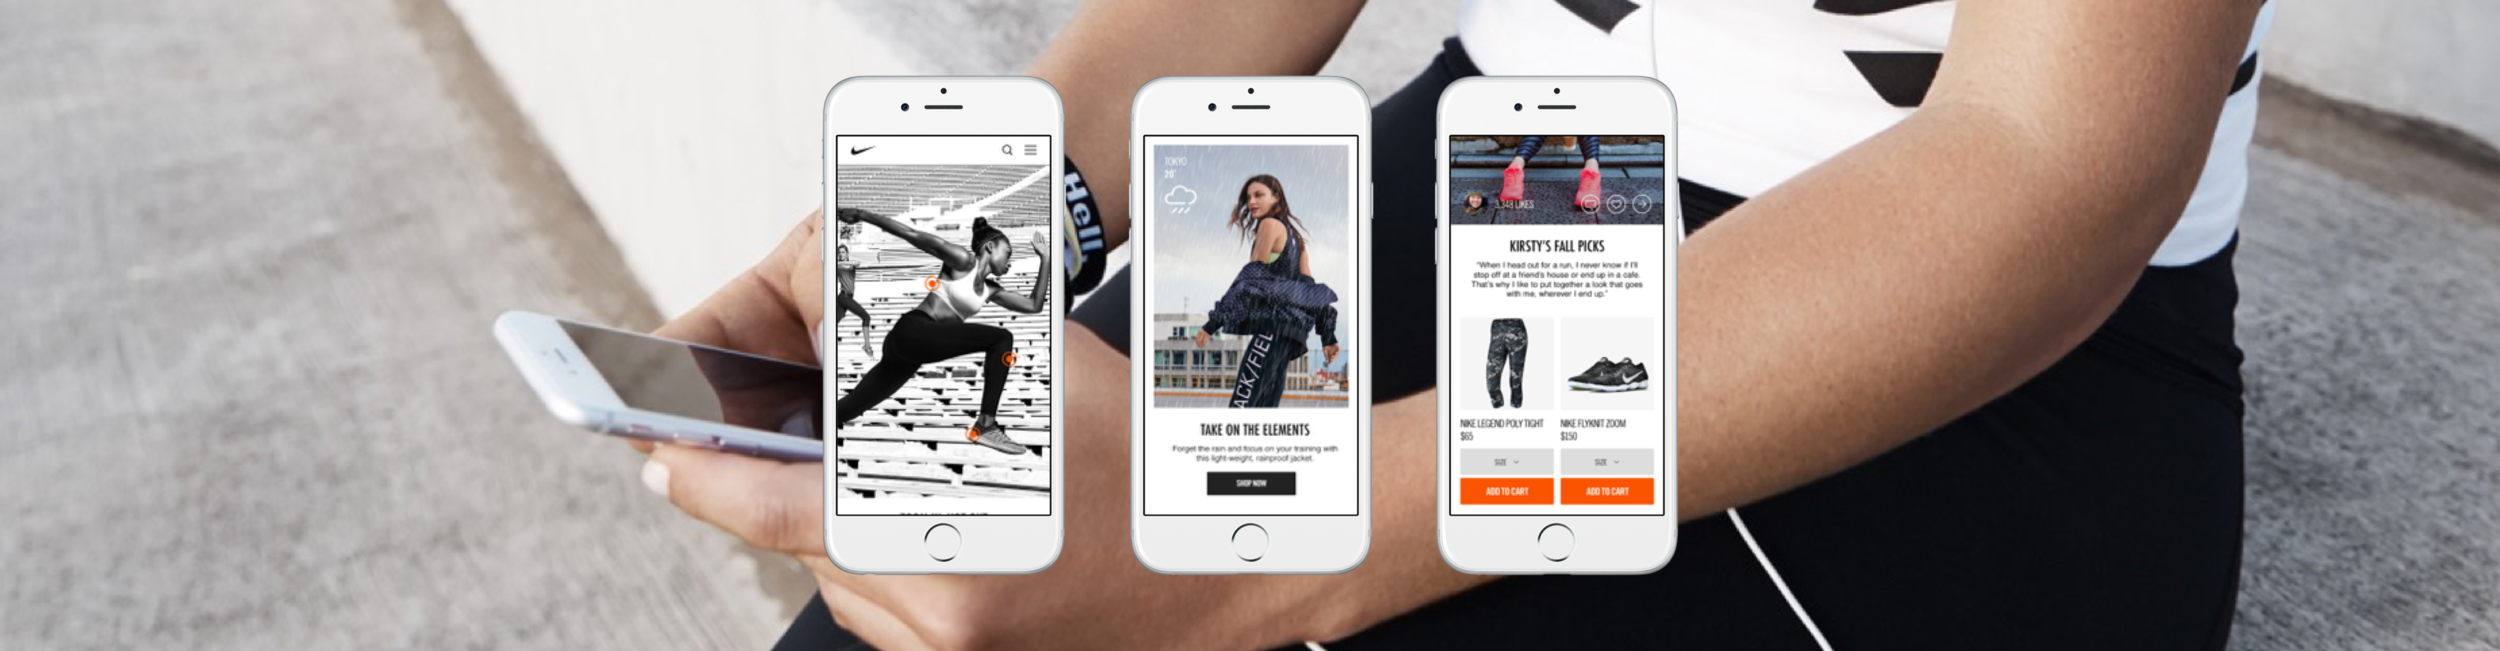 NikeWomenStyleGuide.png